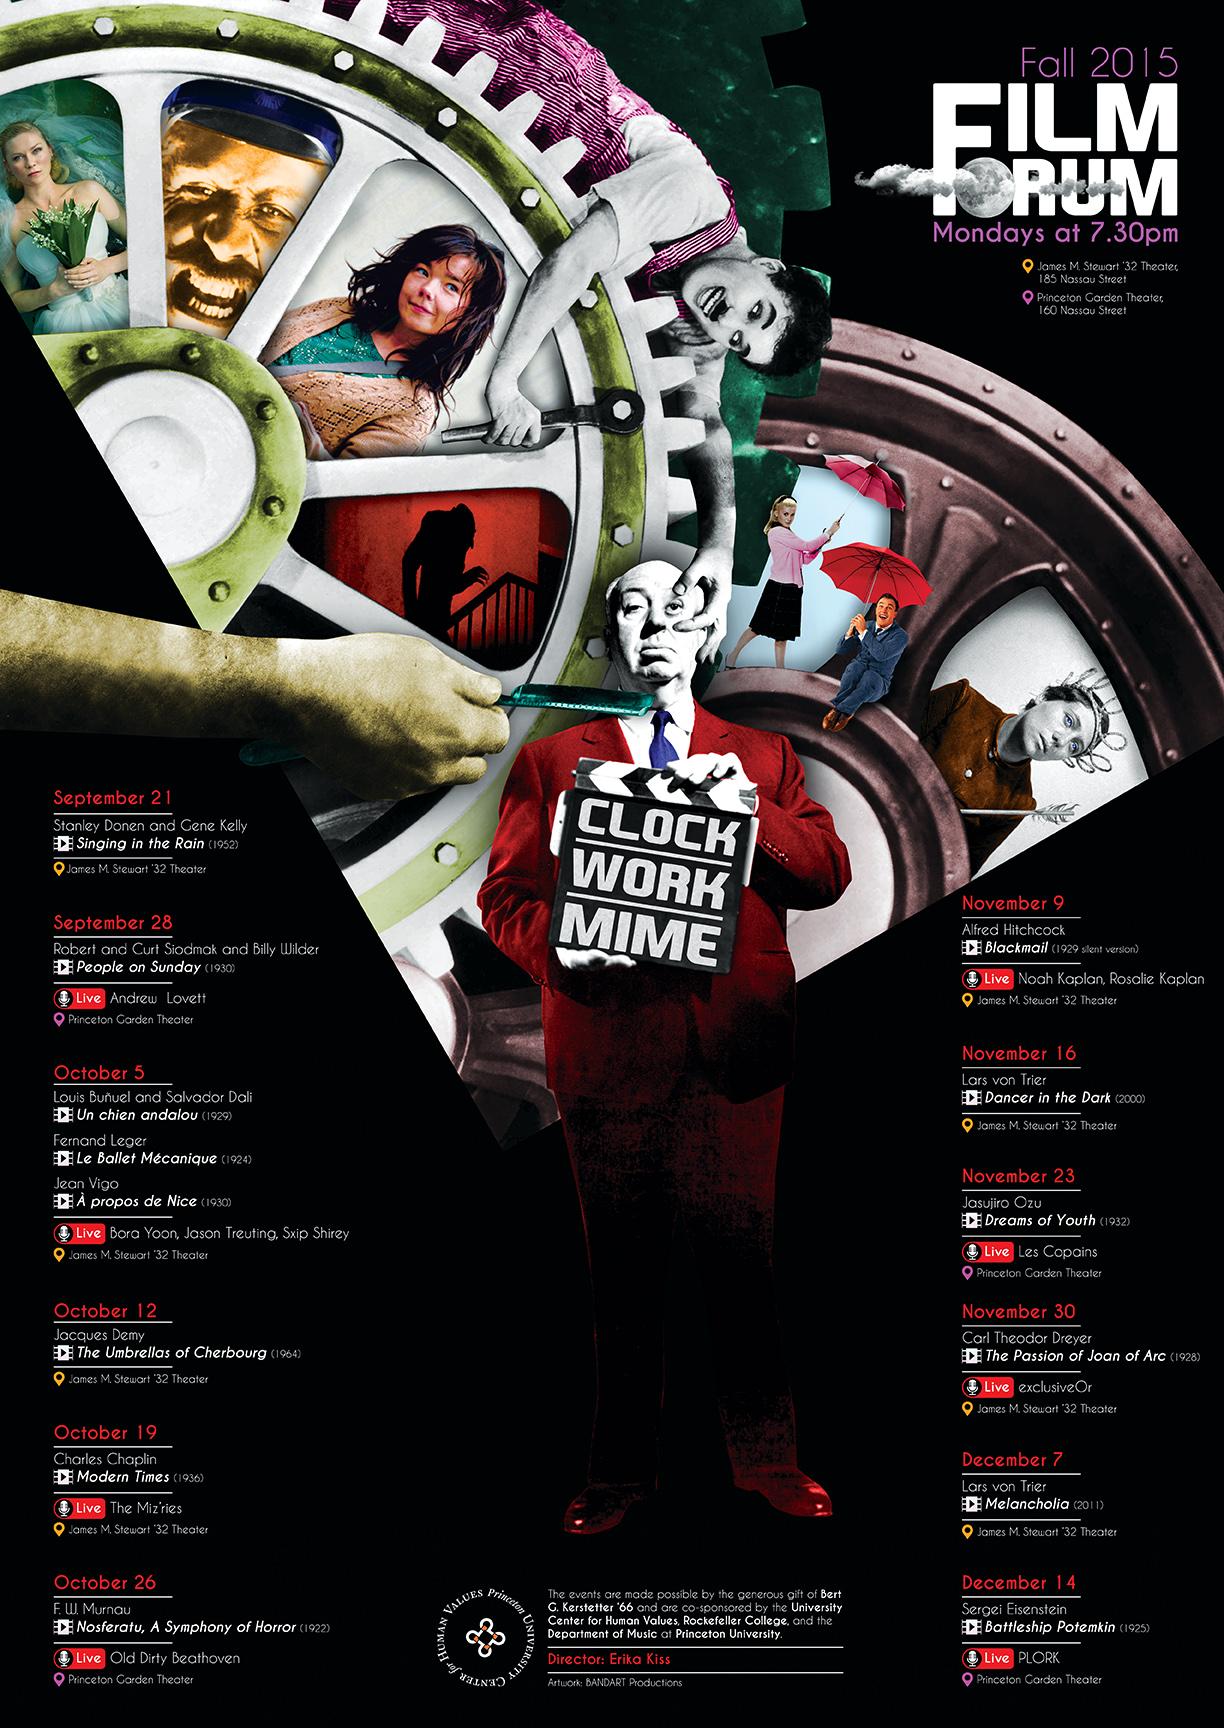 FilmForum 2015 Fall - poster